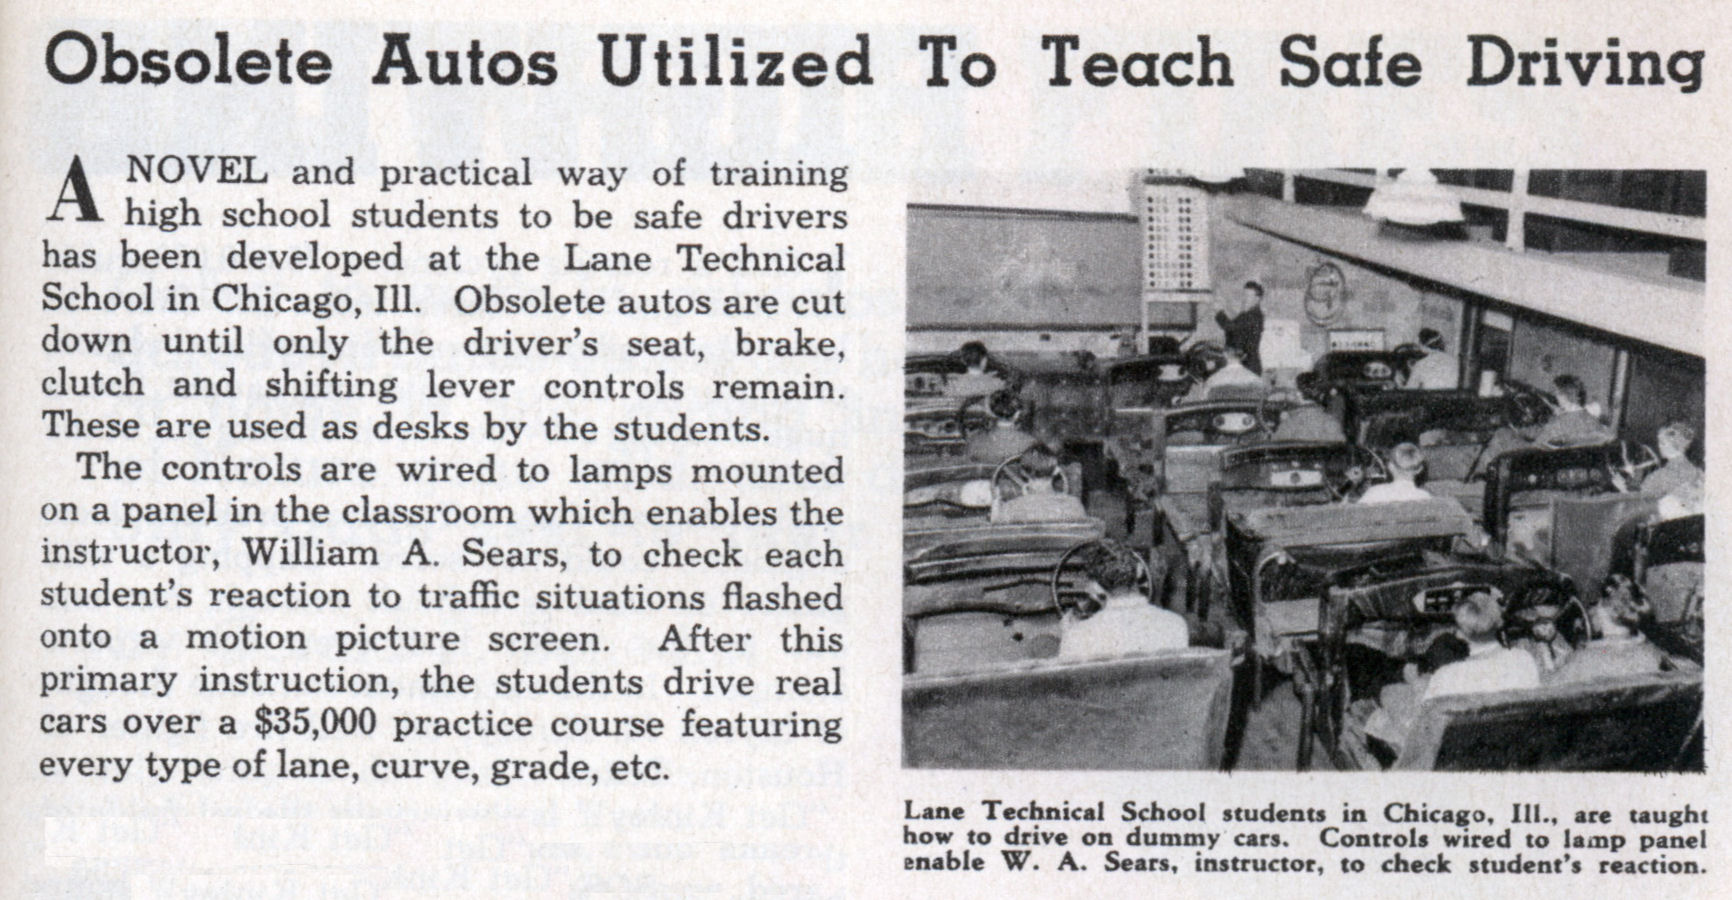 Obsolete Autos Utilized To Teach Safe Driving | Modern ...